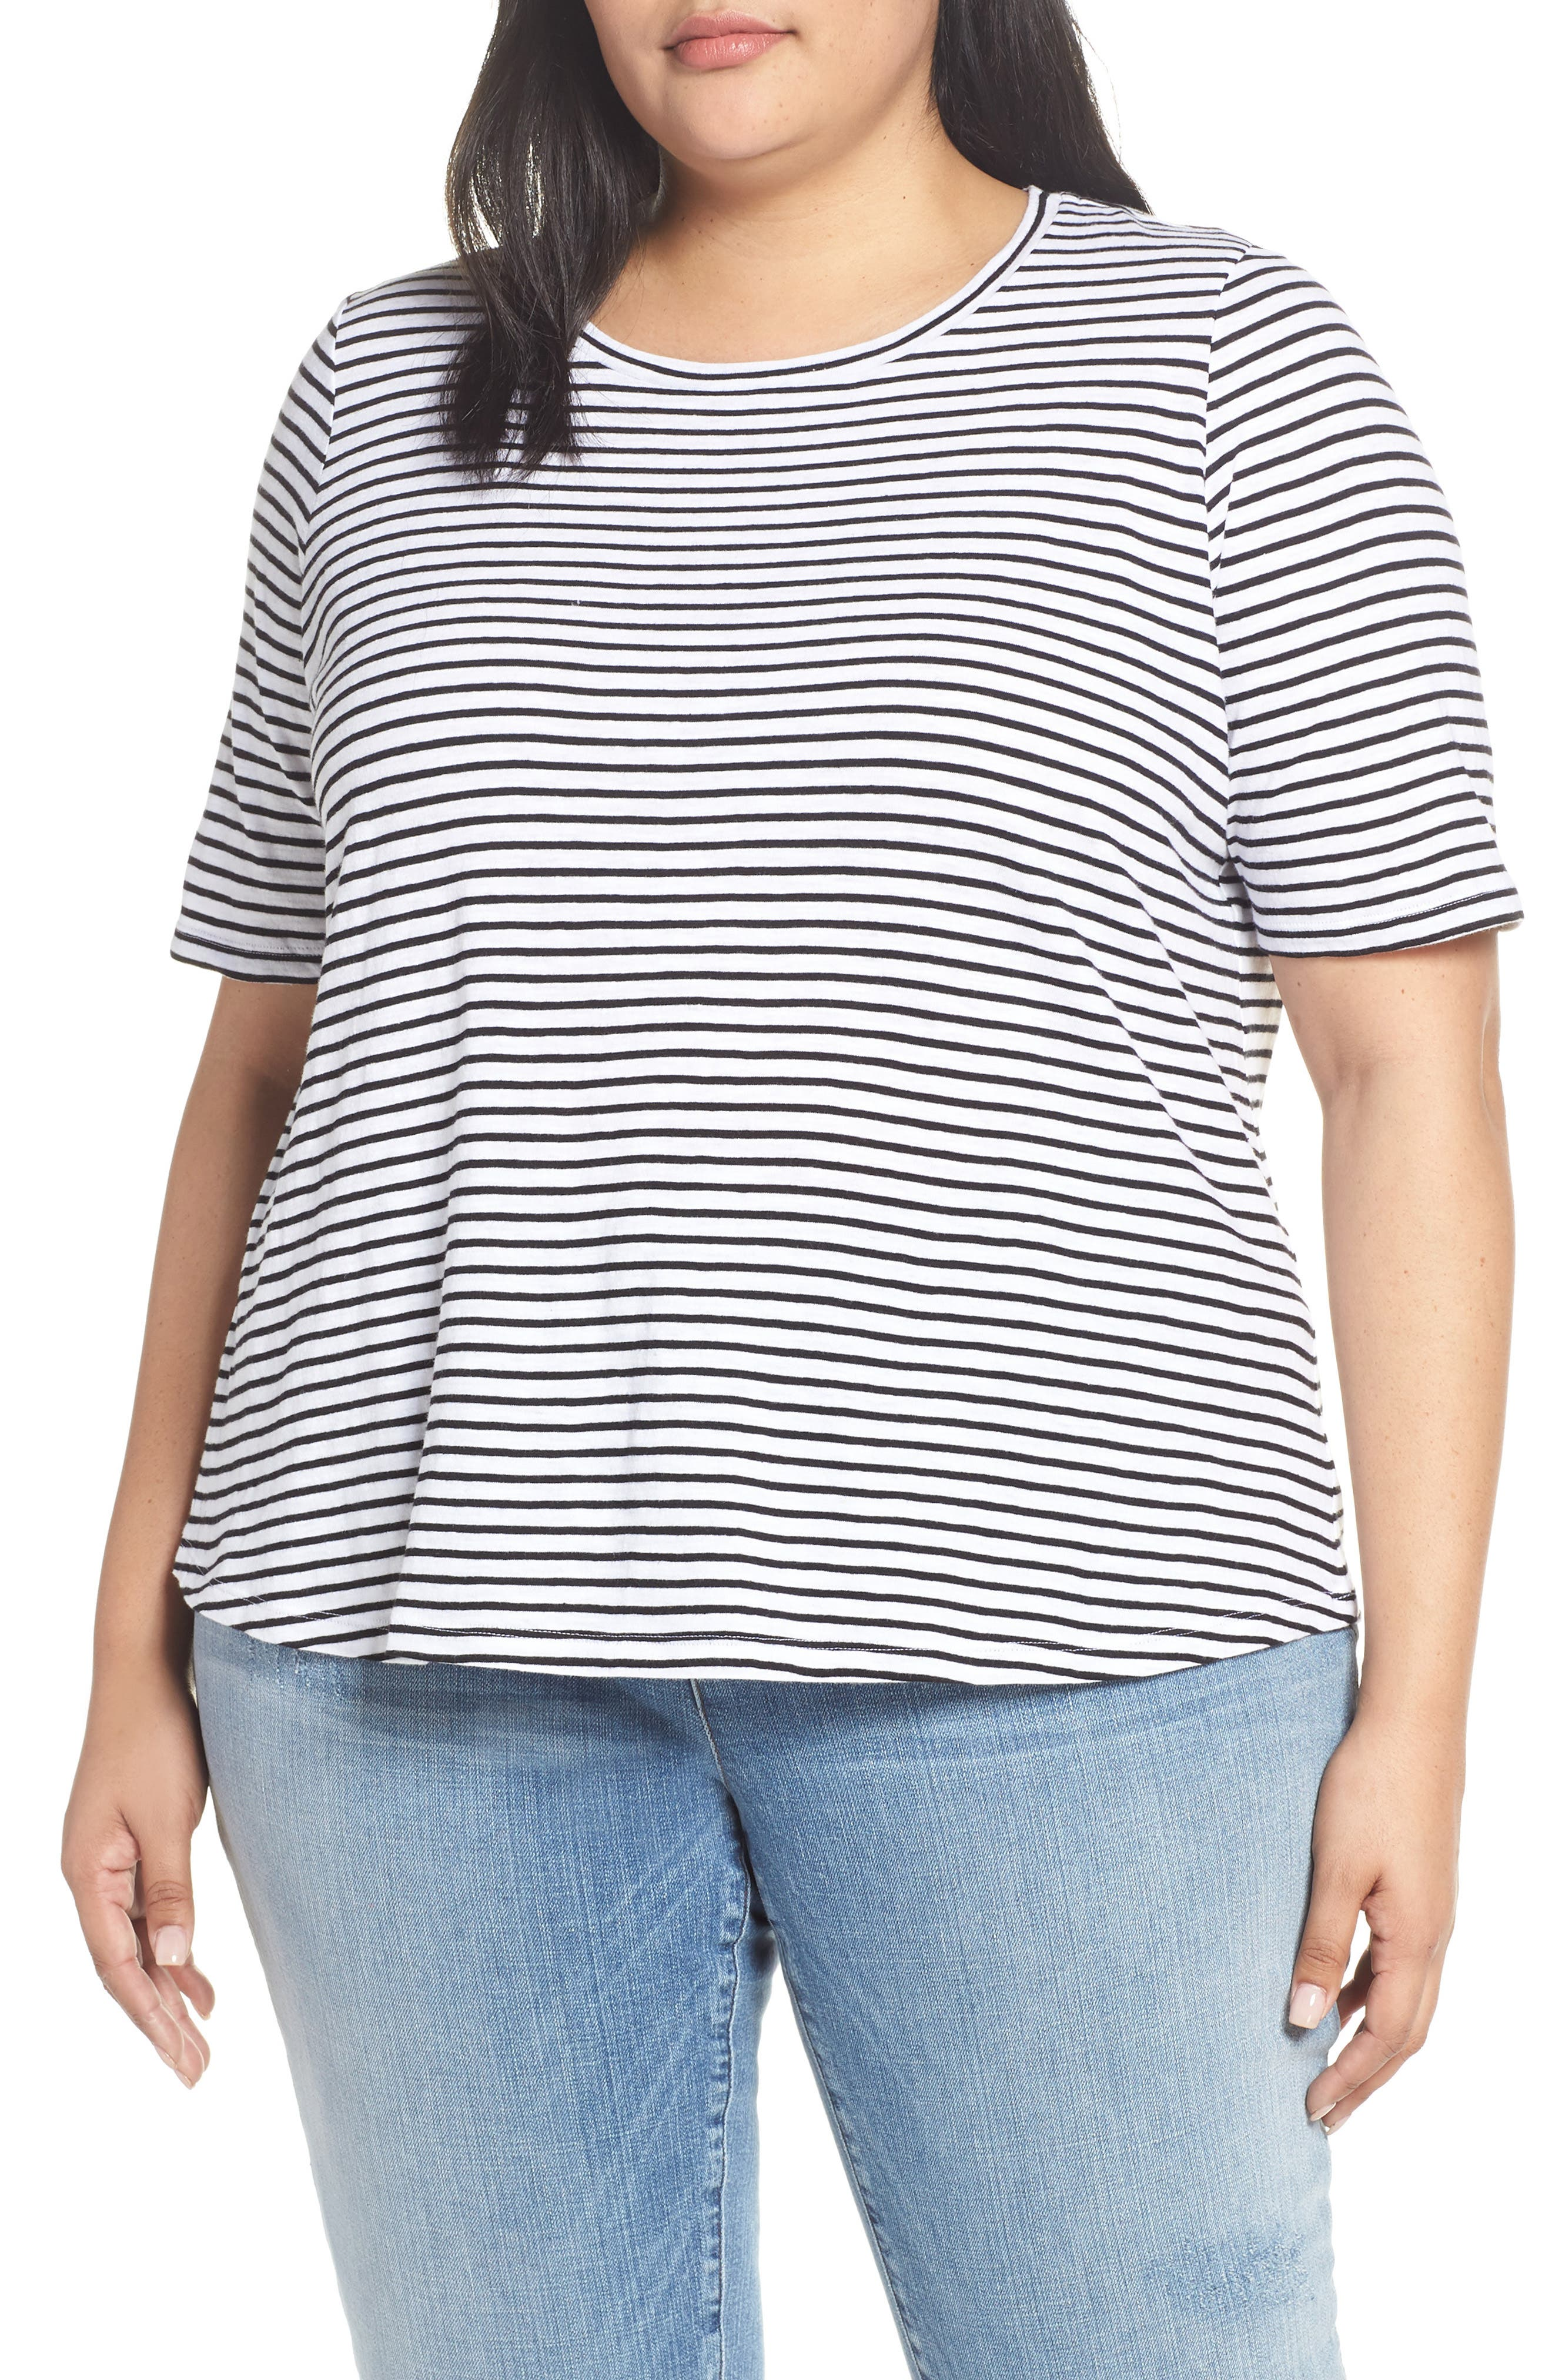 EILEEN FISHER Stripe Organic Cotton Top, Main, color, WHITE/ BLACK